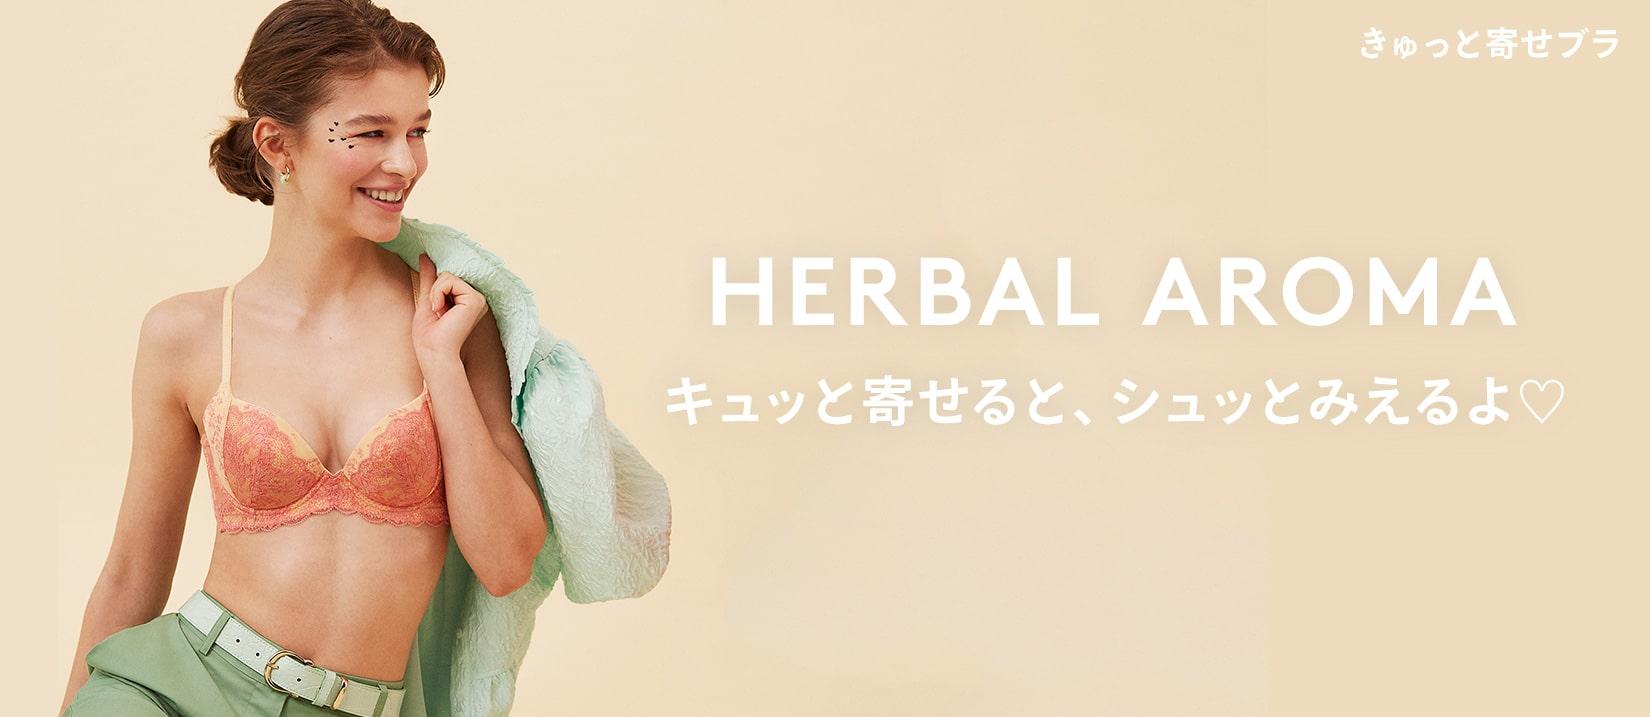 HERBAL AROMA(ハーバルアロマ)